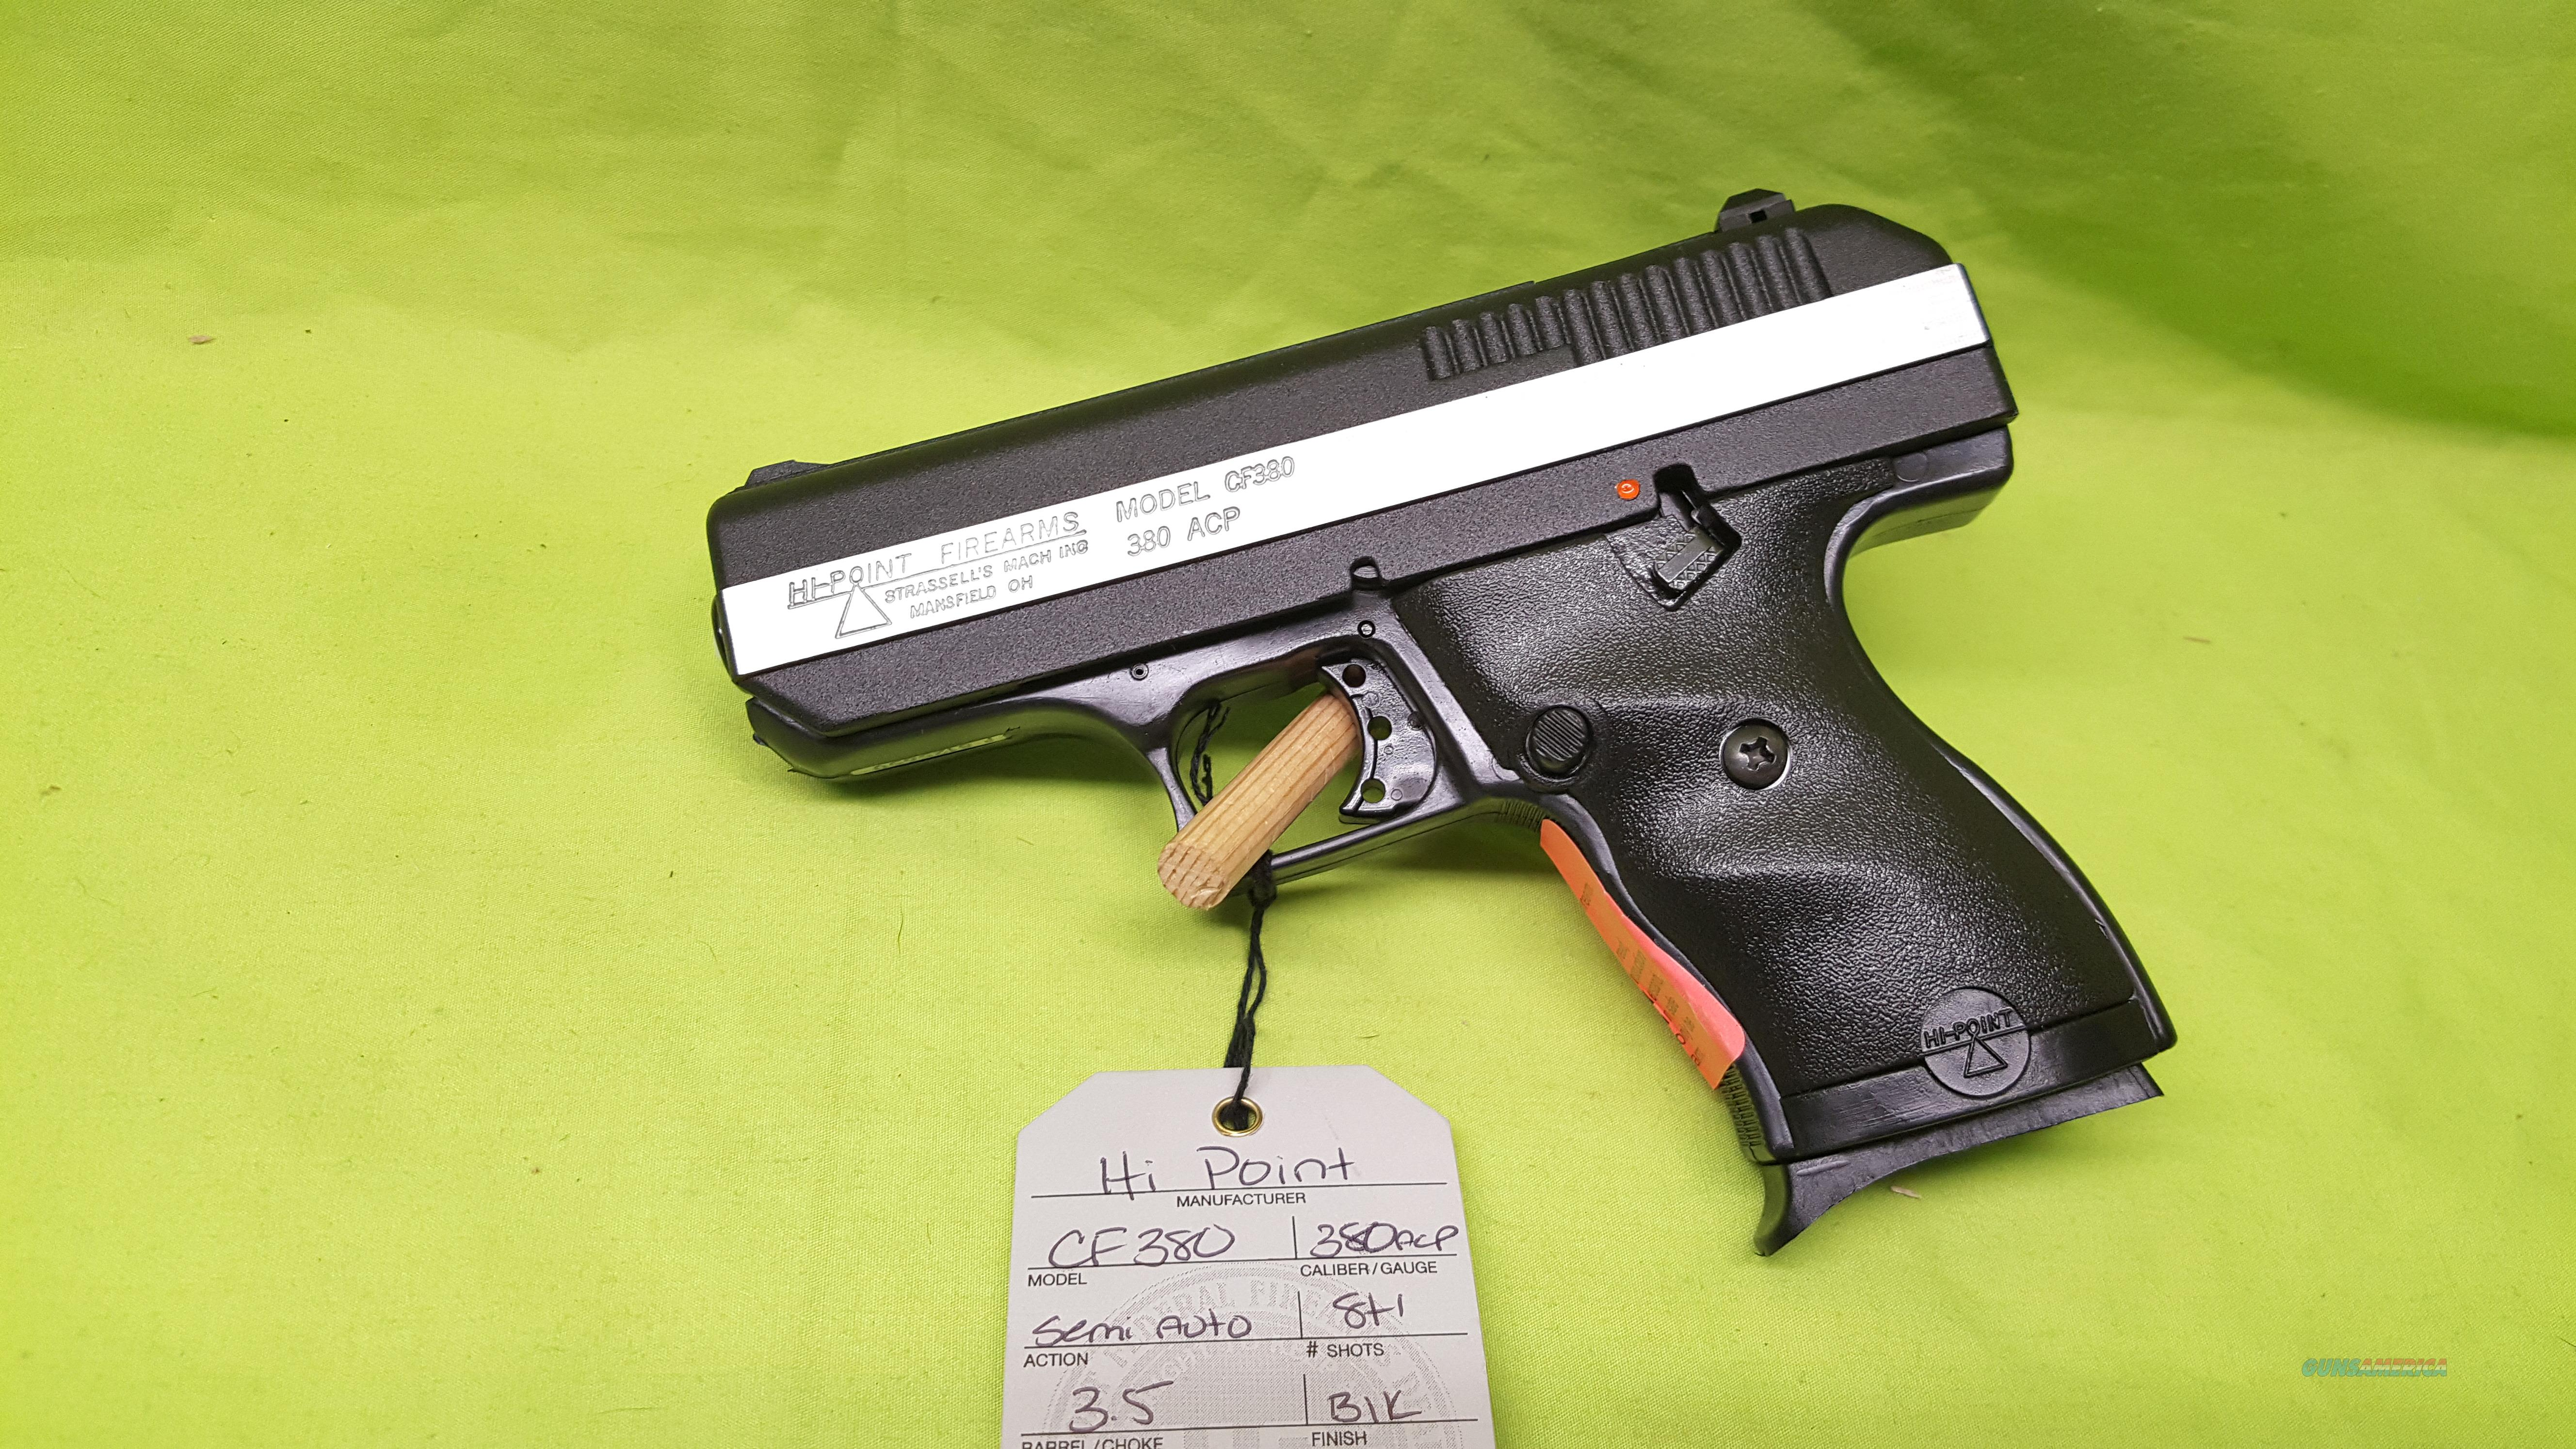 HI-POINT CF380 .380 ACP HI POINT CF 380 8+1 DUOTONE  Guns > Pistols > Hi Point Pistols